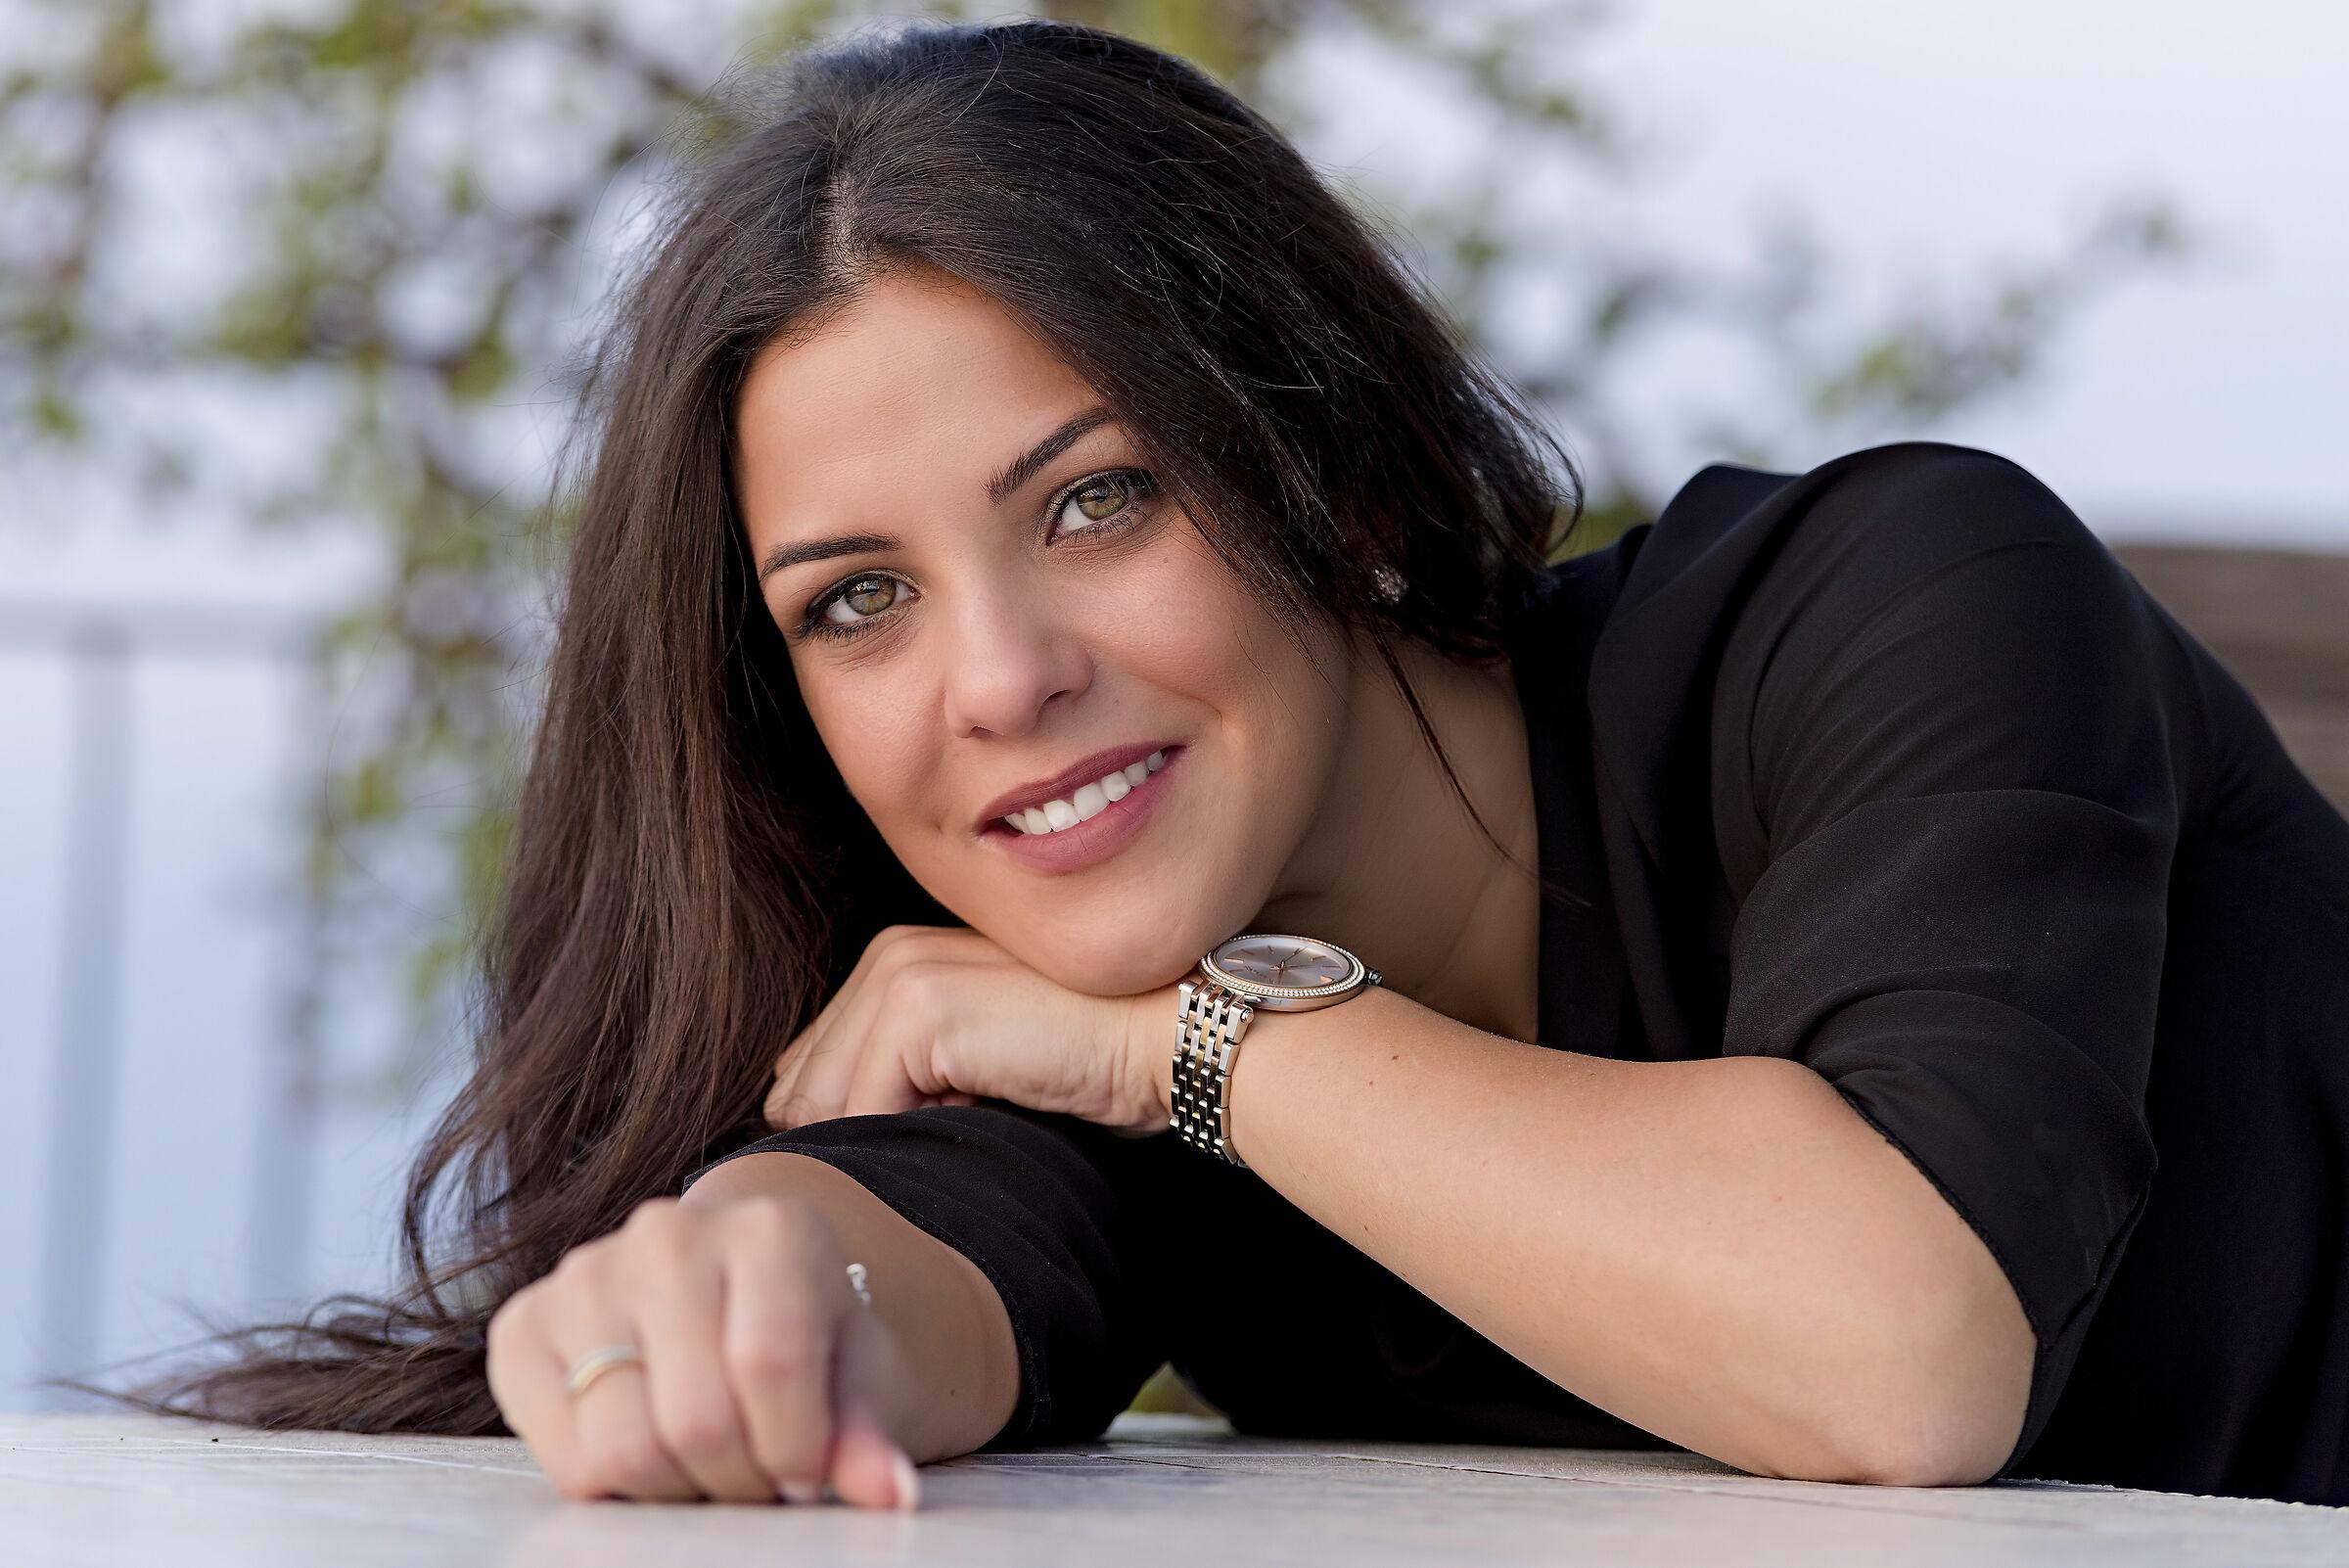 Rosanna smile ...